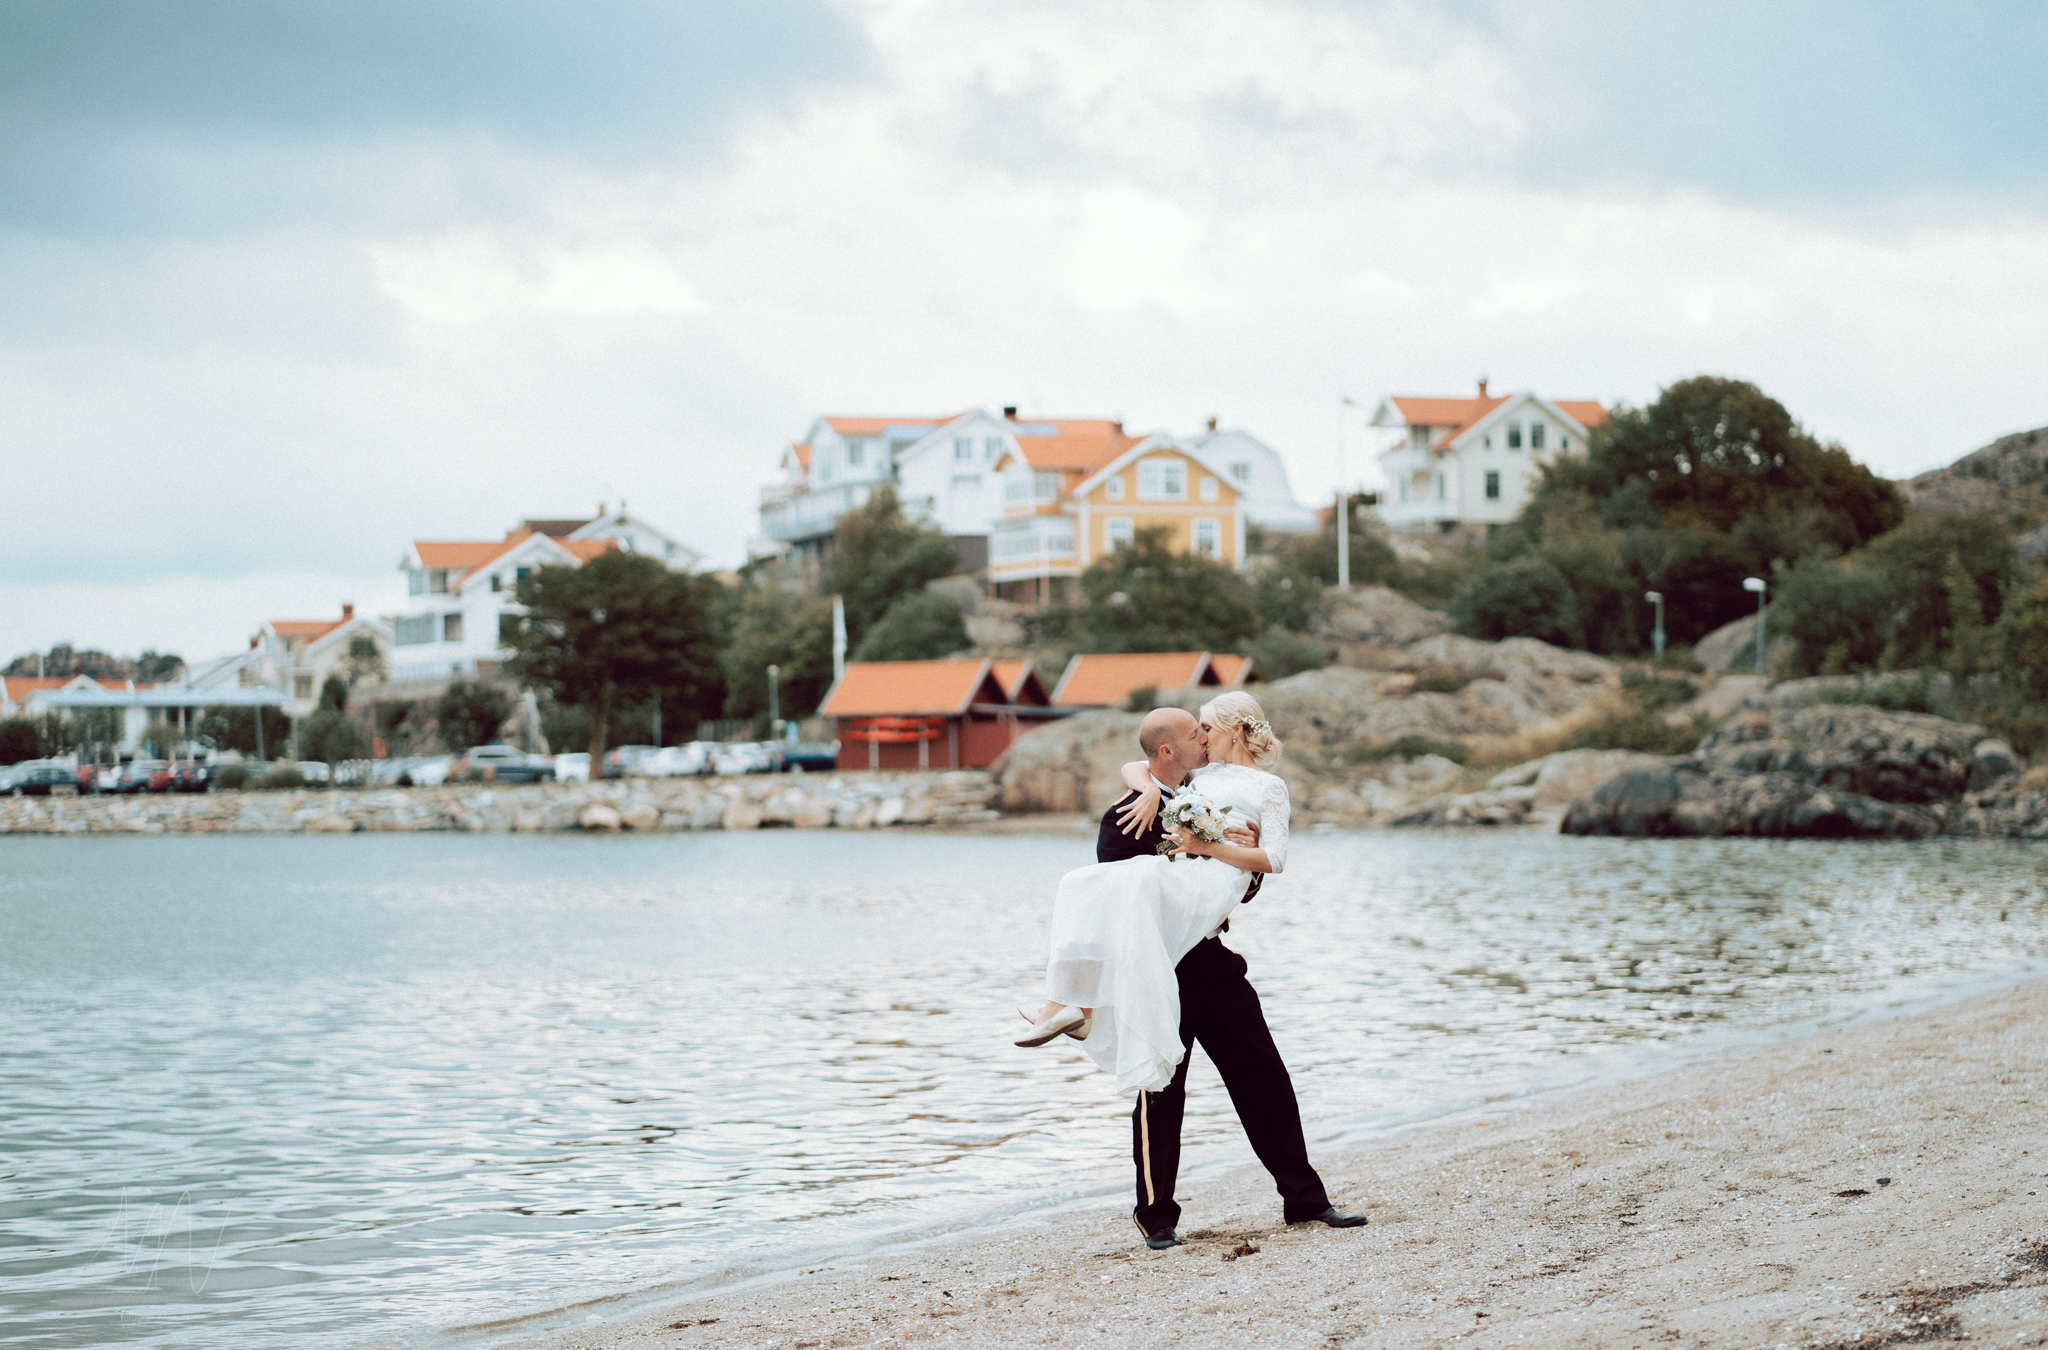 Bröllop-fotografmaxnorin.se-MariaMarcus-402.JPG